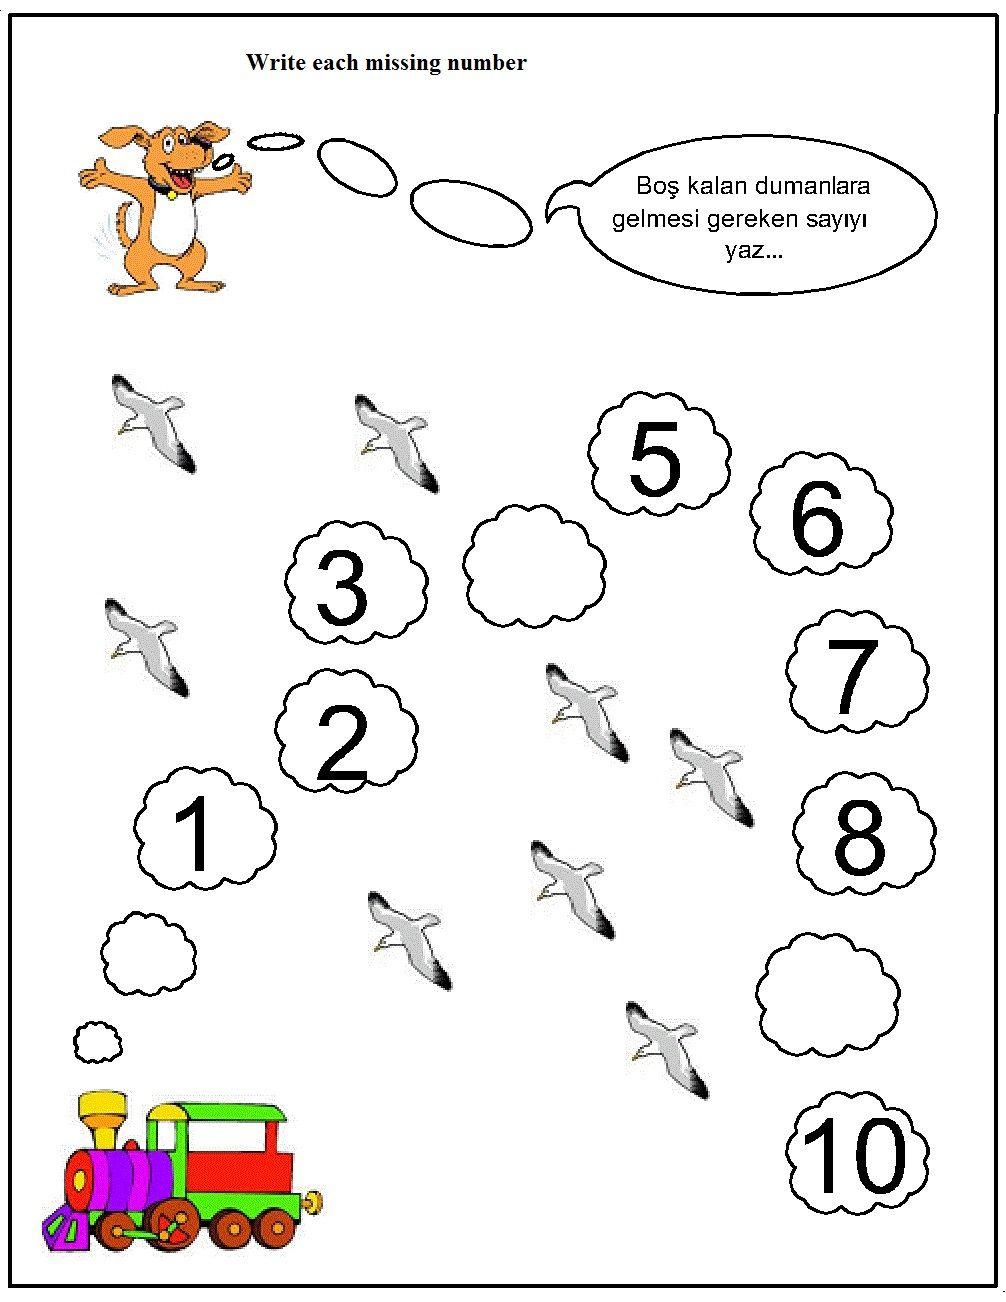 Missing Number Worksheet For Kids 1 10 Crafts And Worksheets For Preschool Toddle Missing Number Worksheets Number Worksheets Kindergarten Number Worksheets [ 1302 x 1006 Pixel ]